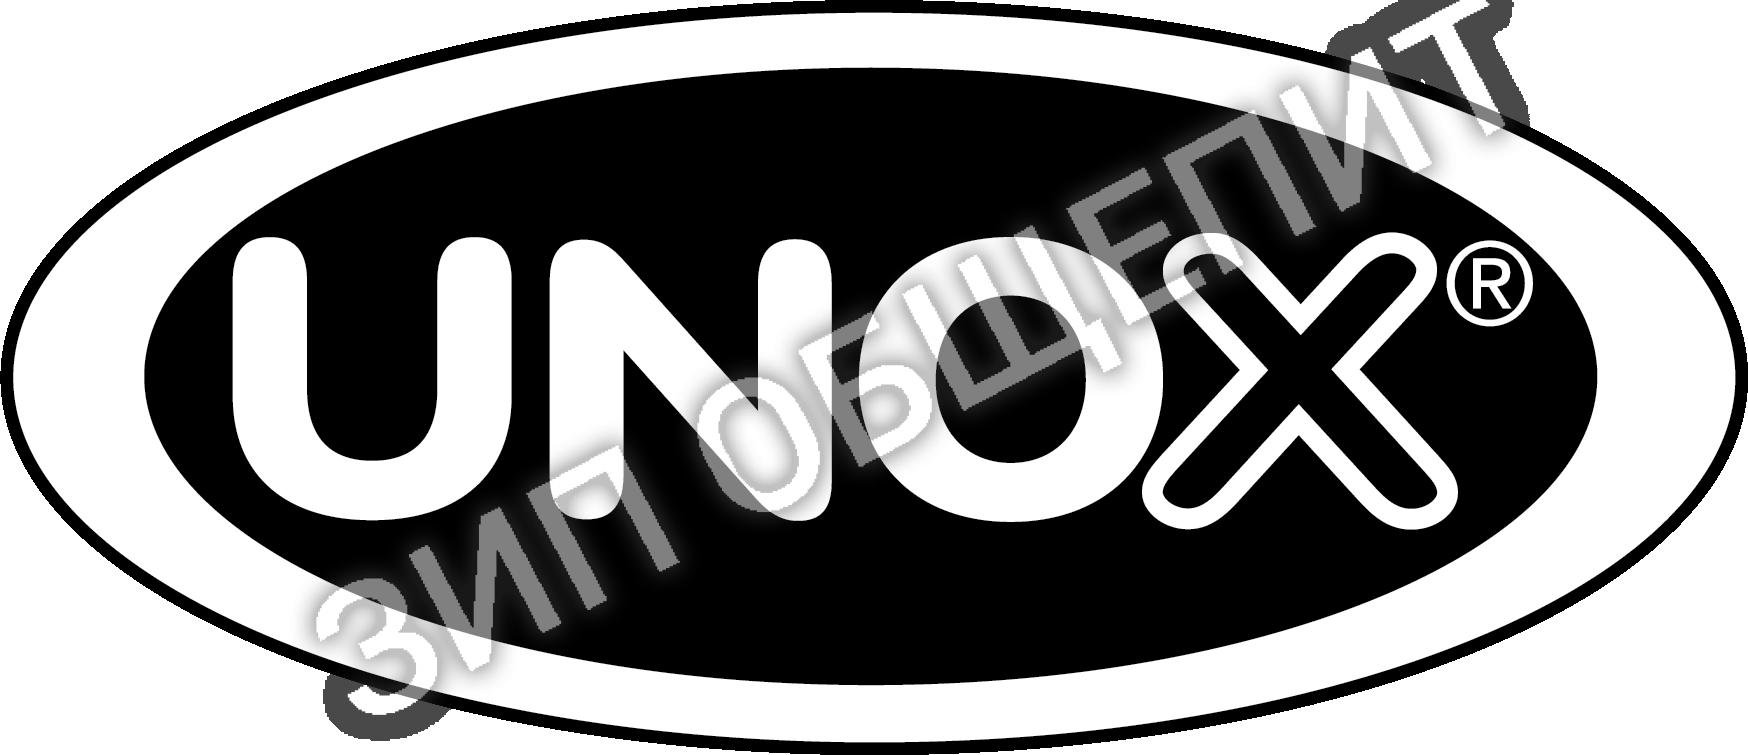 Втулка VM2274A0 для пароконвектомата UNOX модели XEVC-0511-E1R